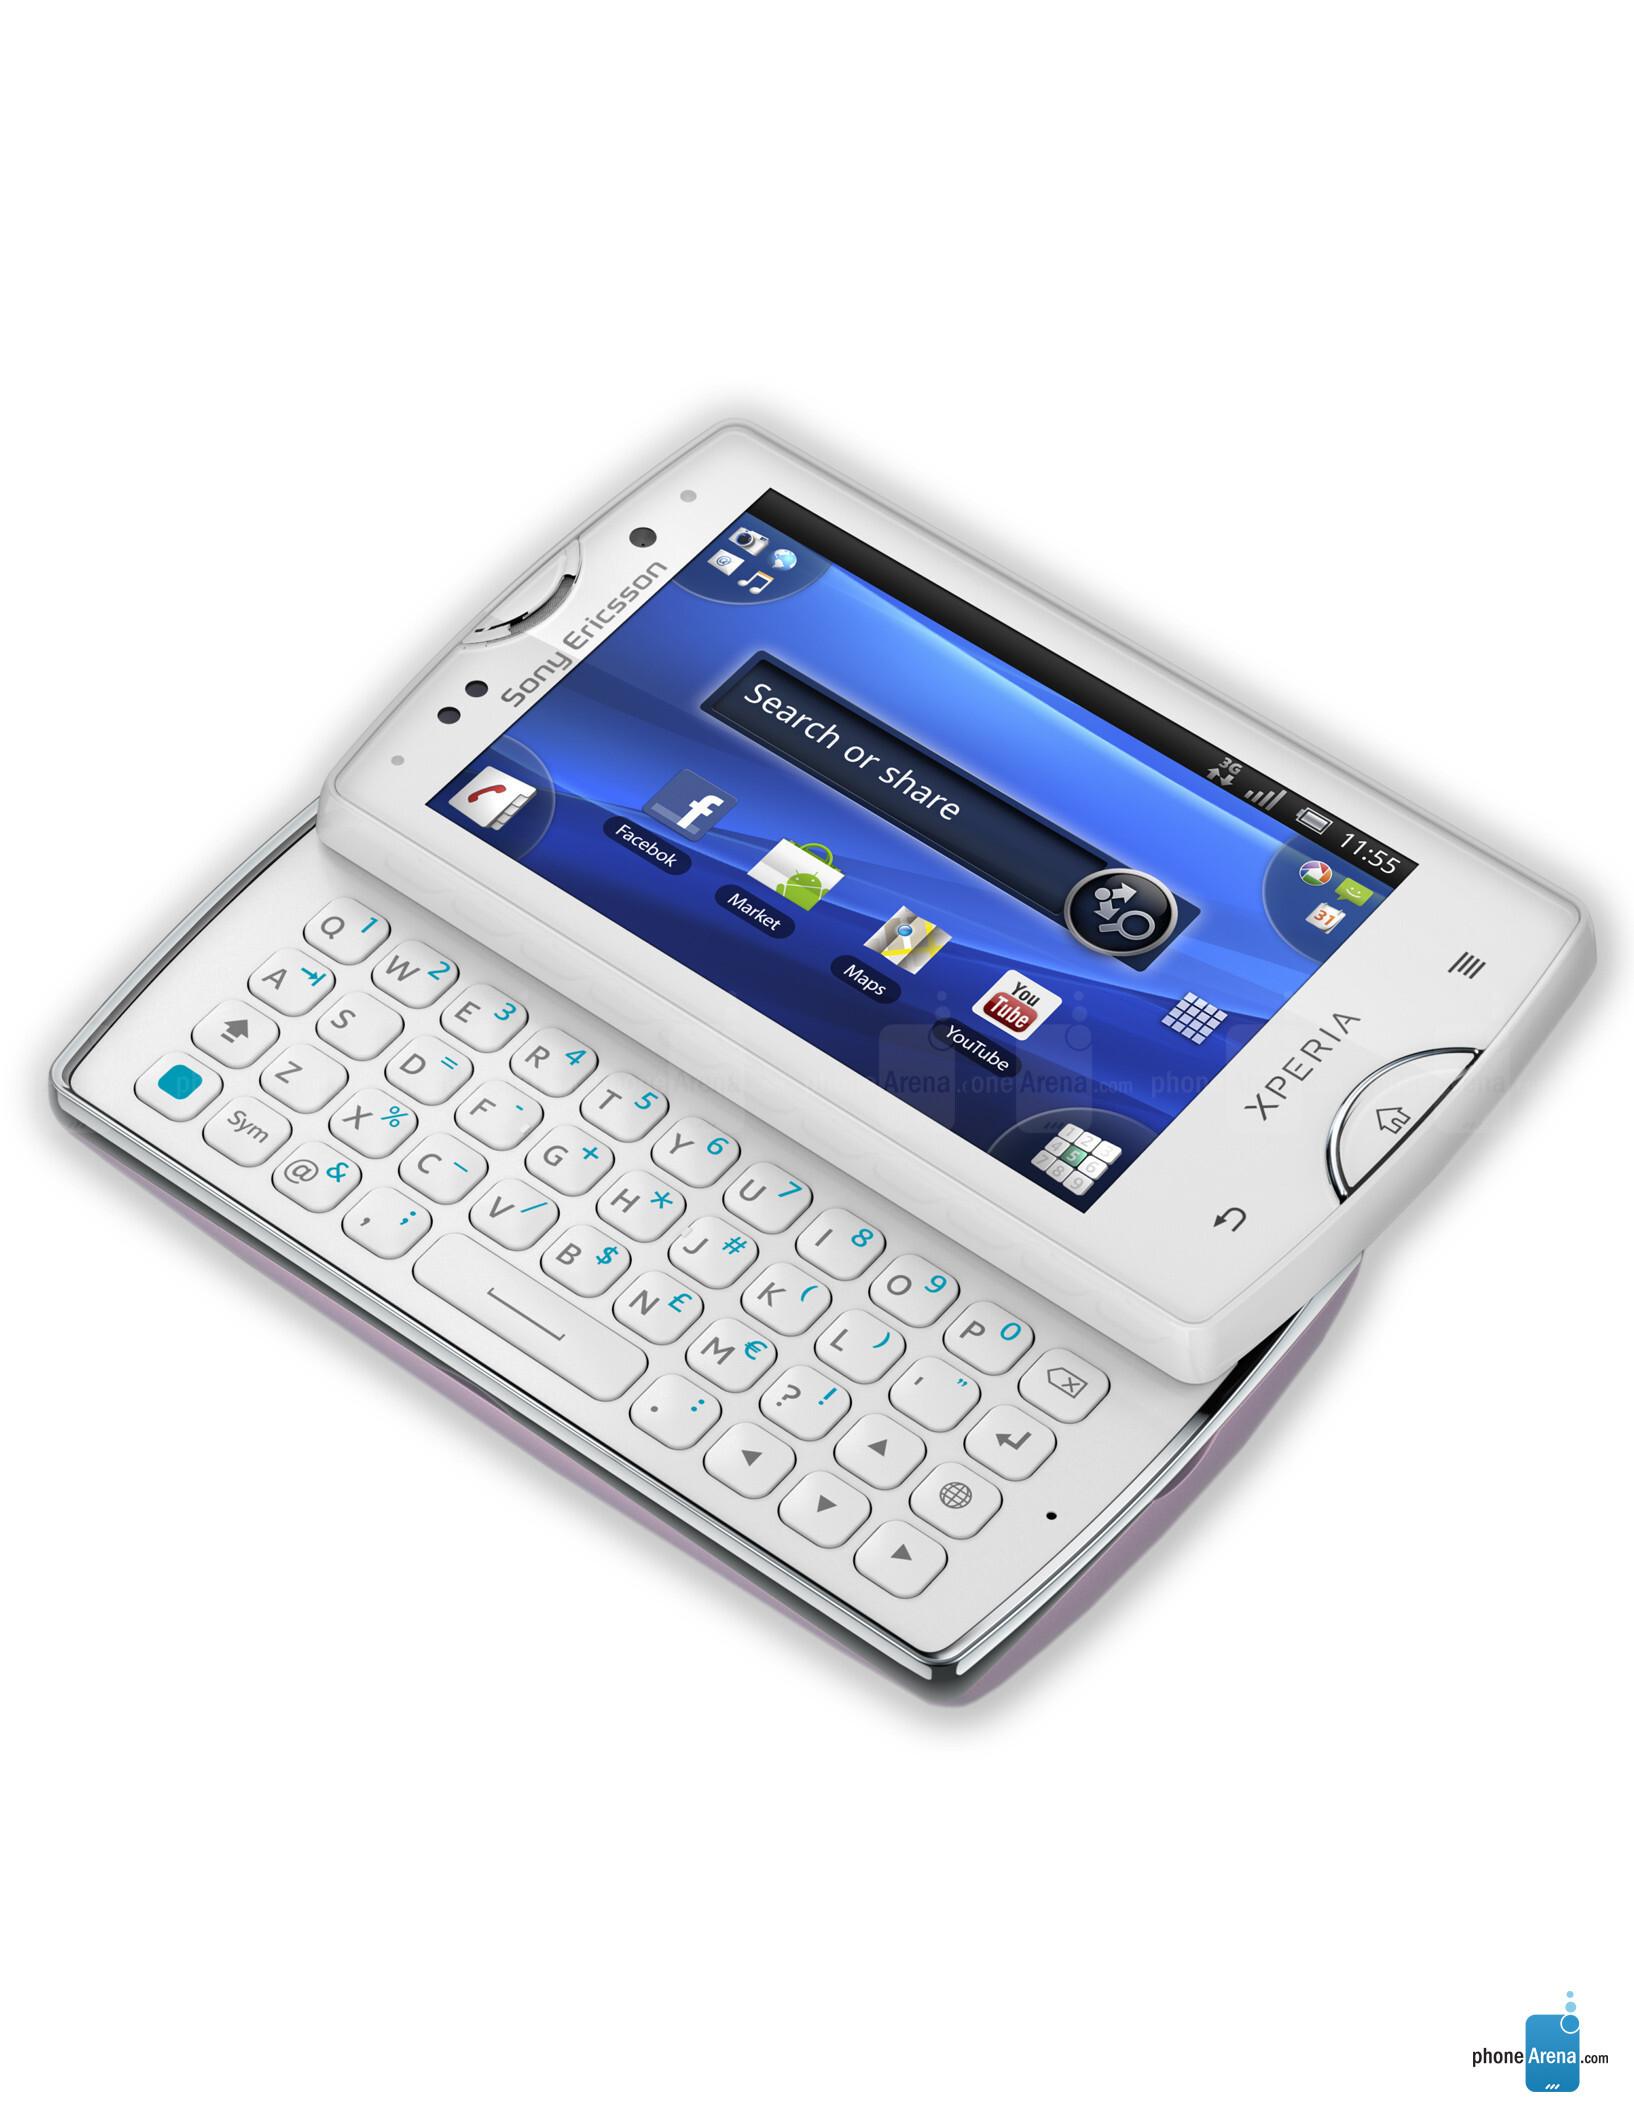 Sony Ericsson Xperia mini pro specs